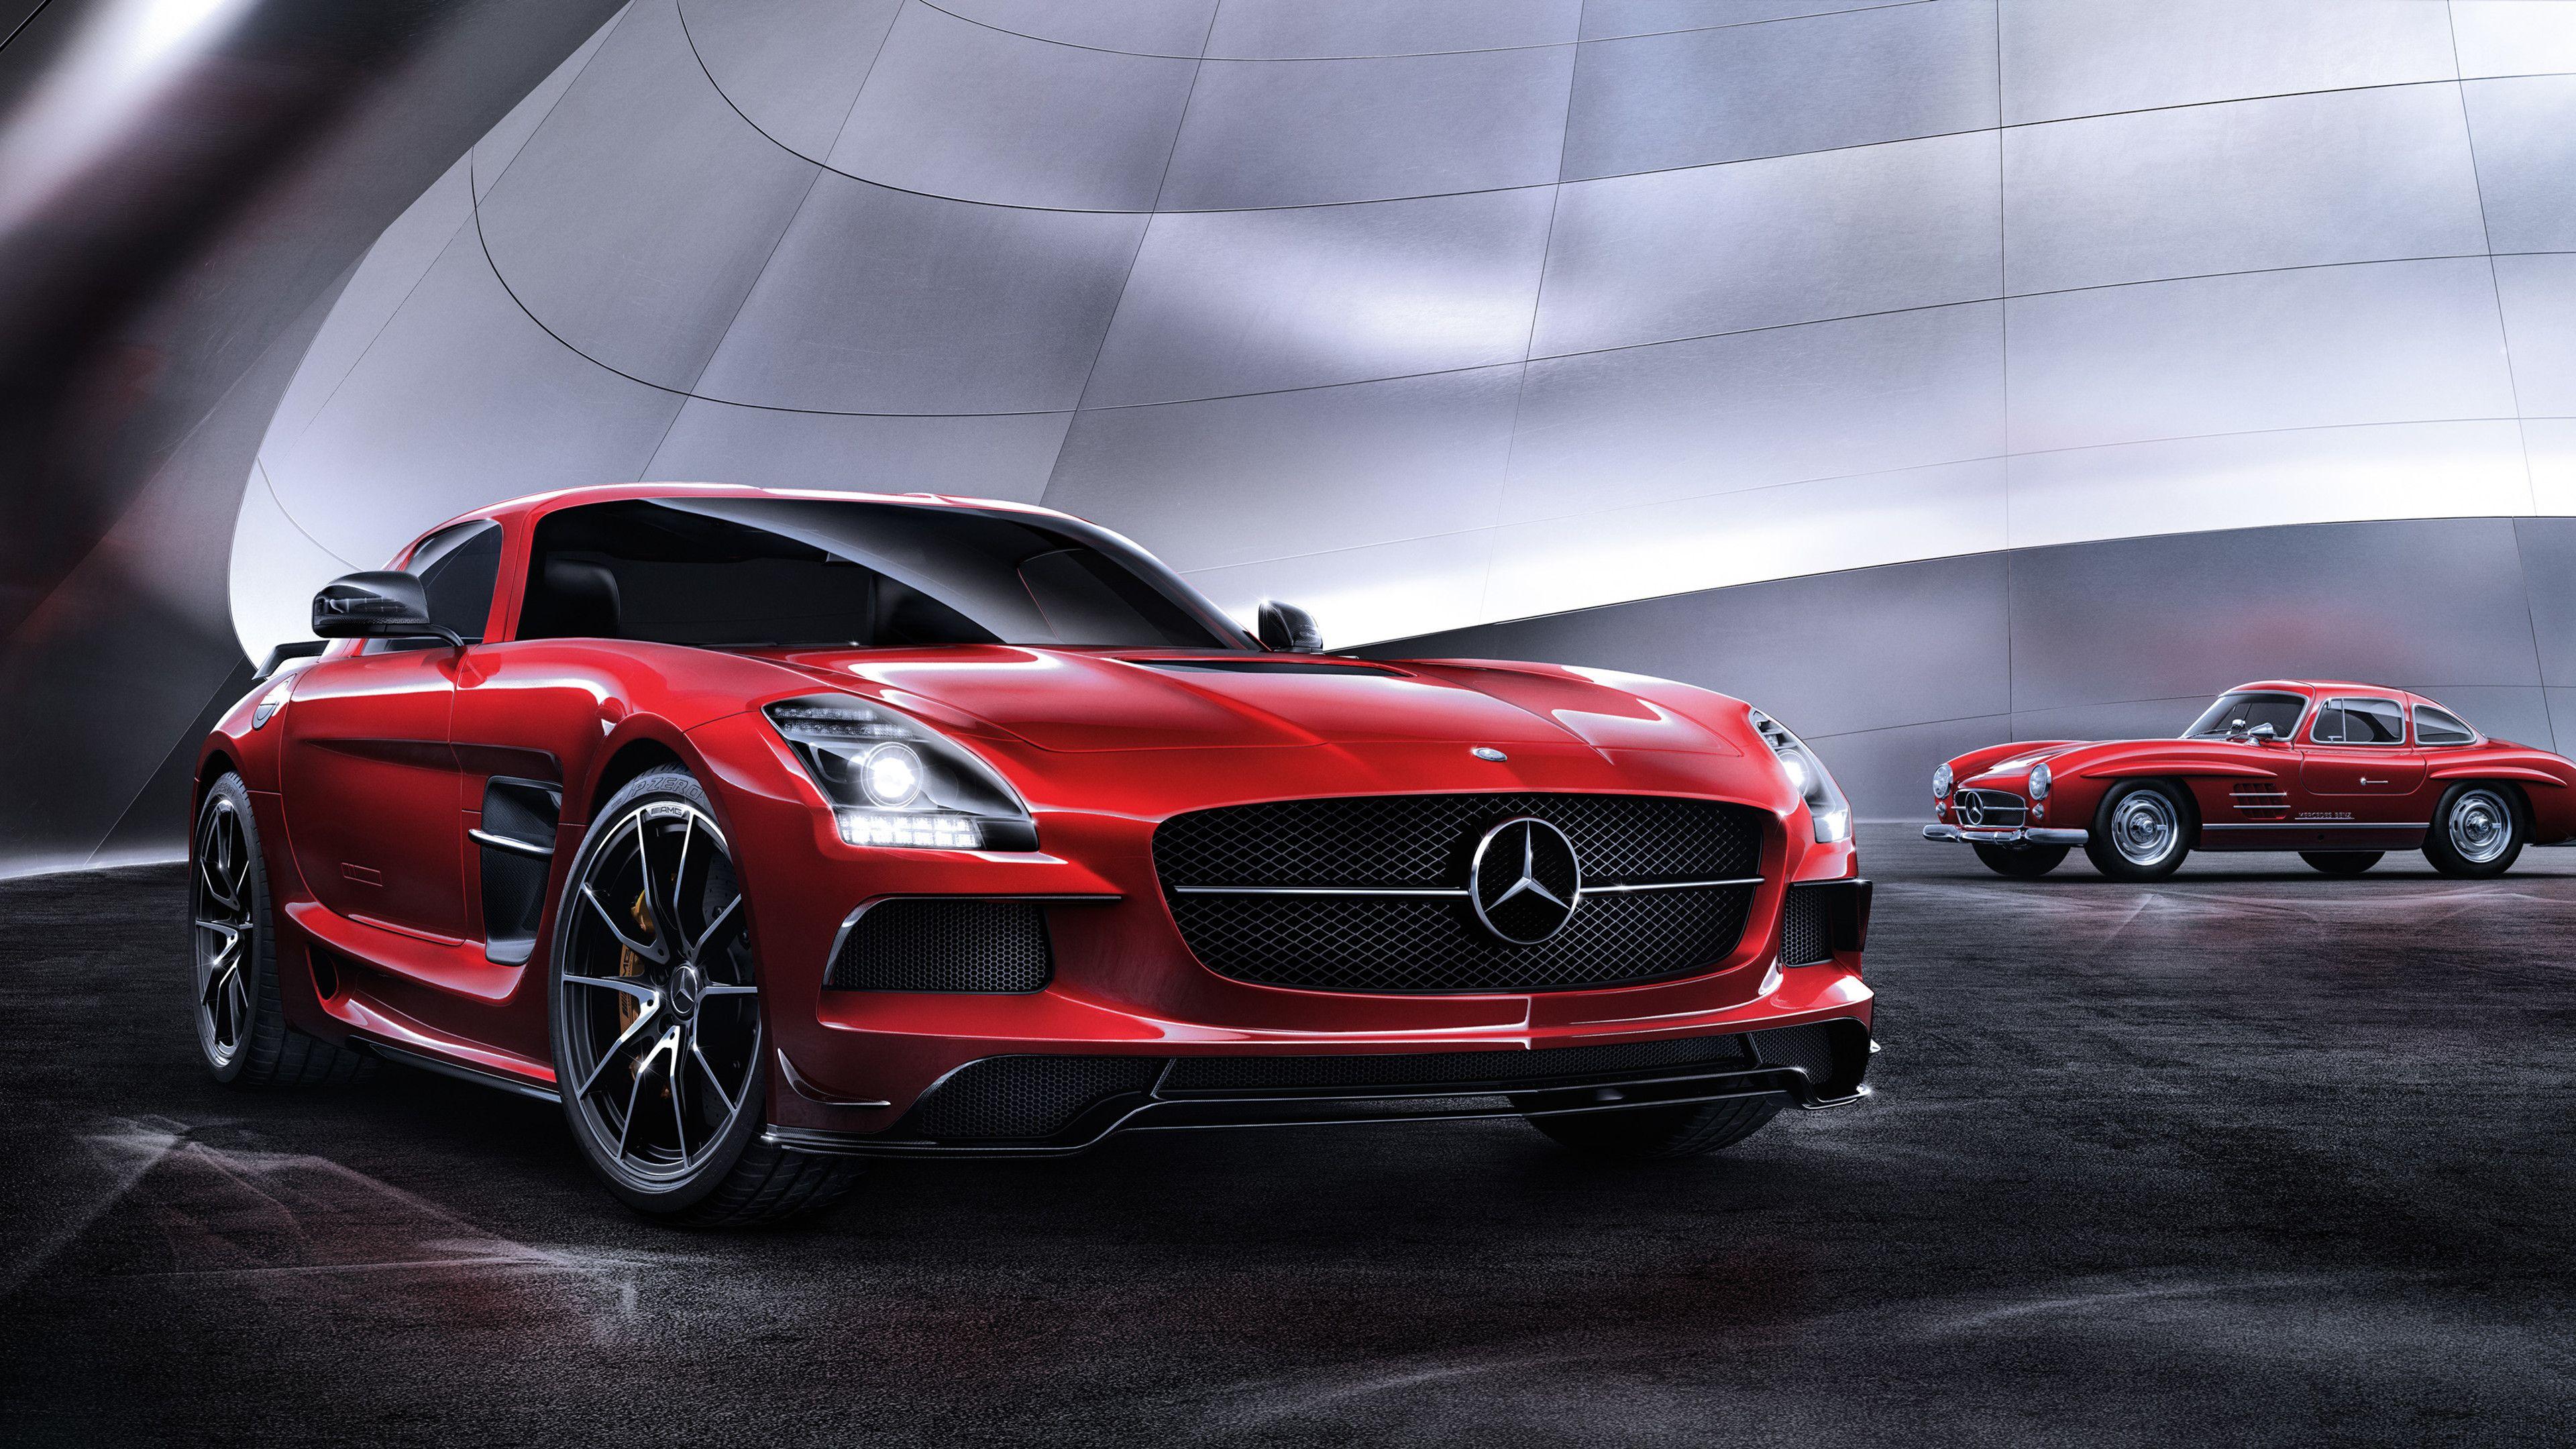 Wallpaper 4k Mercedes Sls Amg 2018 Cars Wallpapers 4k Wallpapers